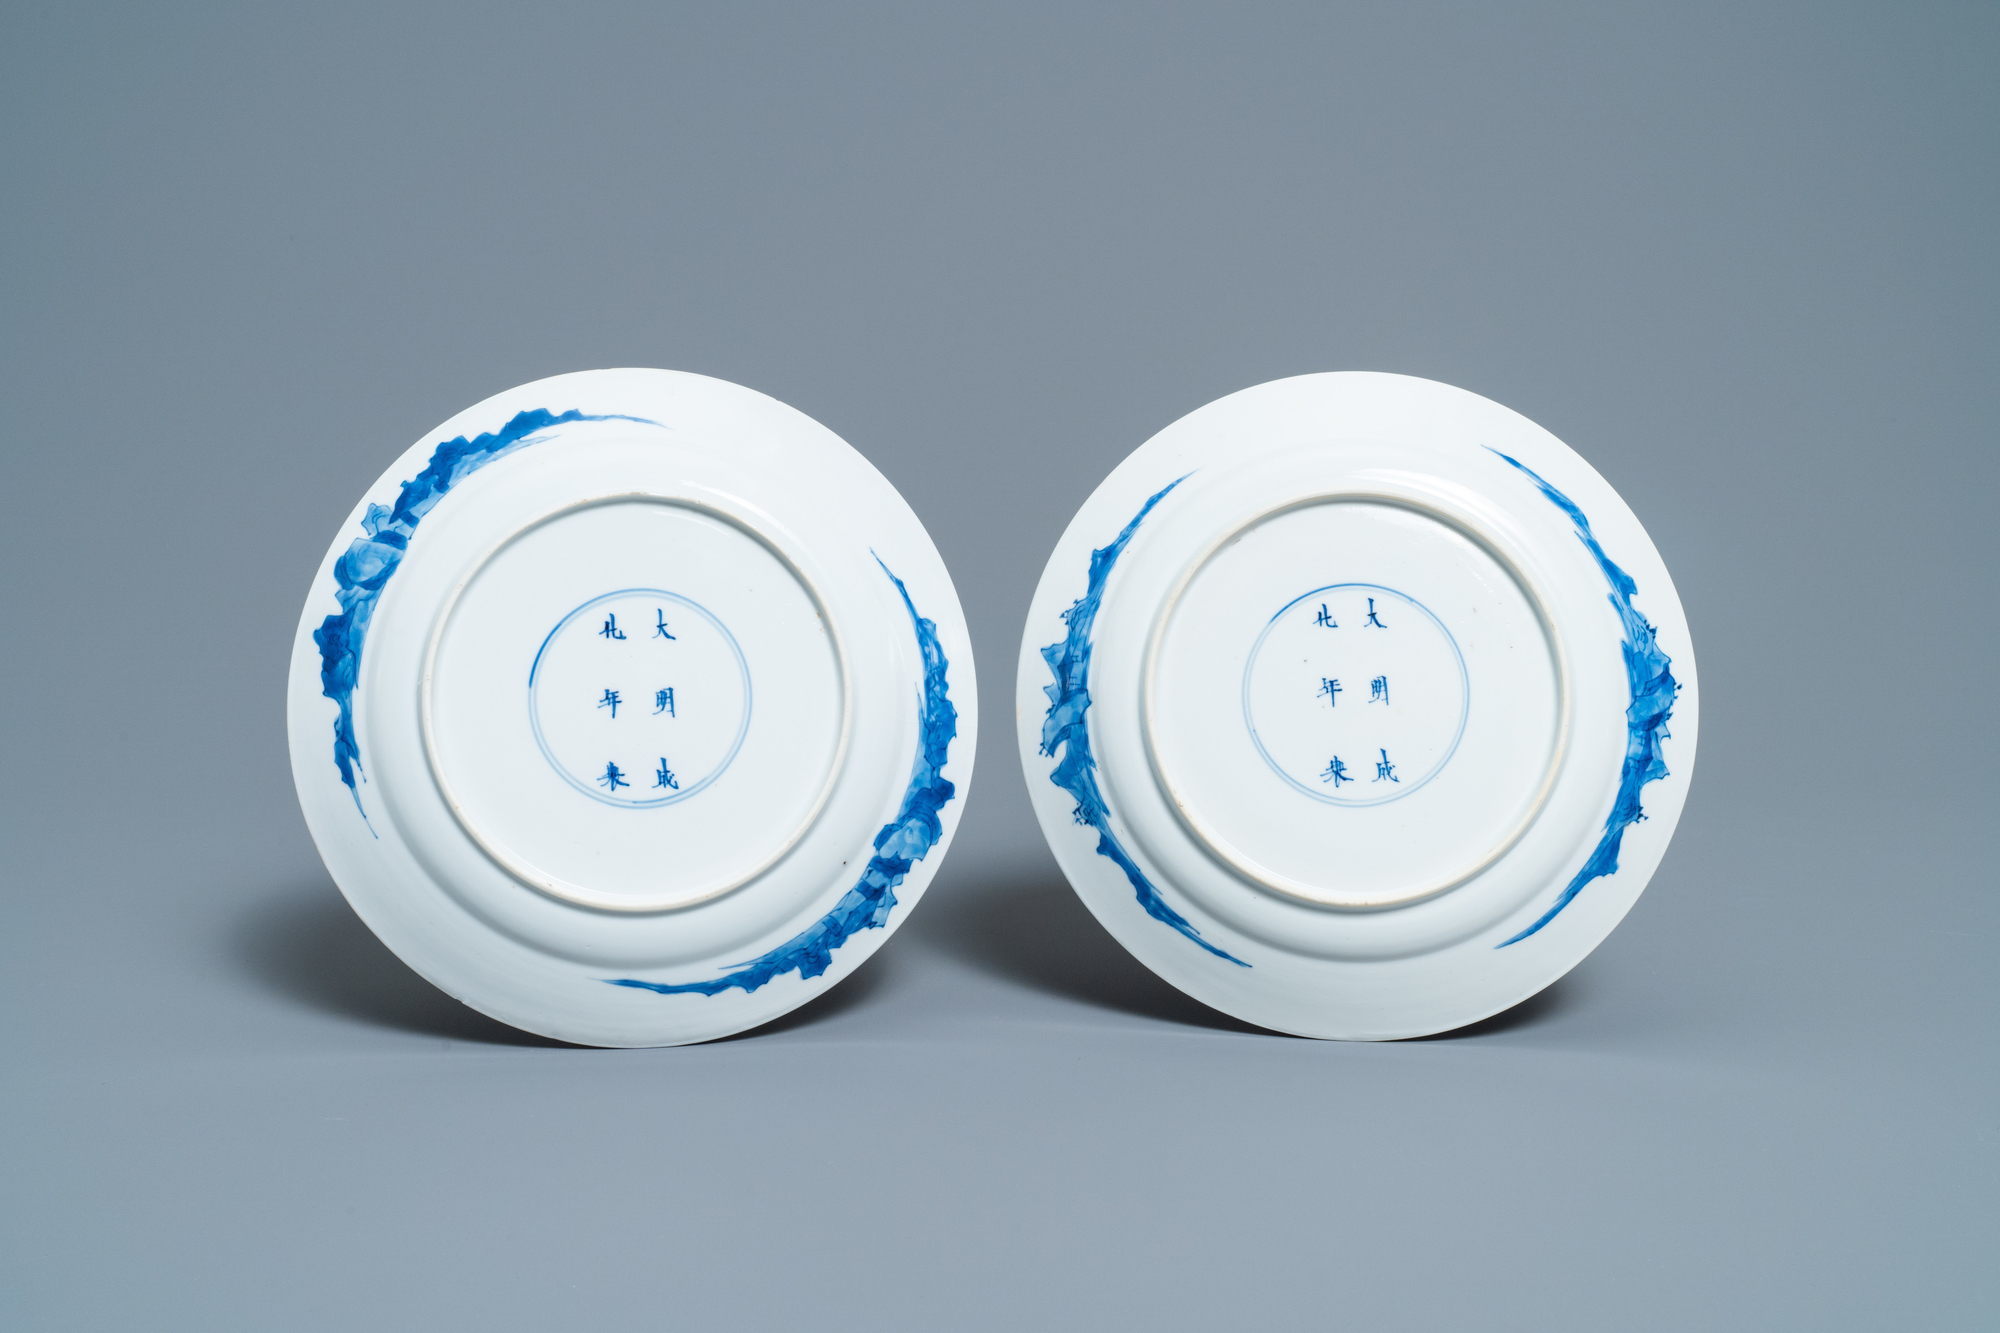 Five Chinese blue and white figurative plates, Kangxi and Chenghua marks, Kangxi - Image 3 of 5